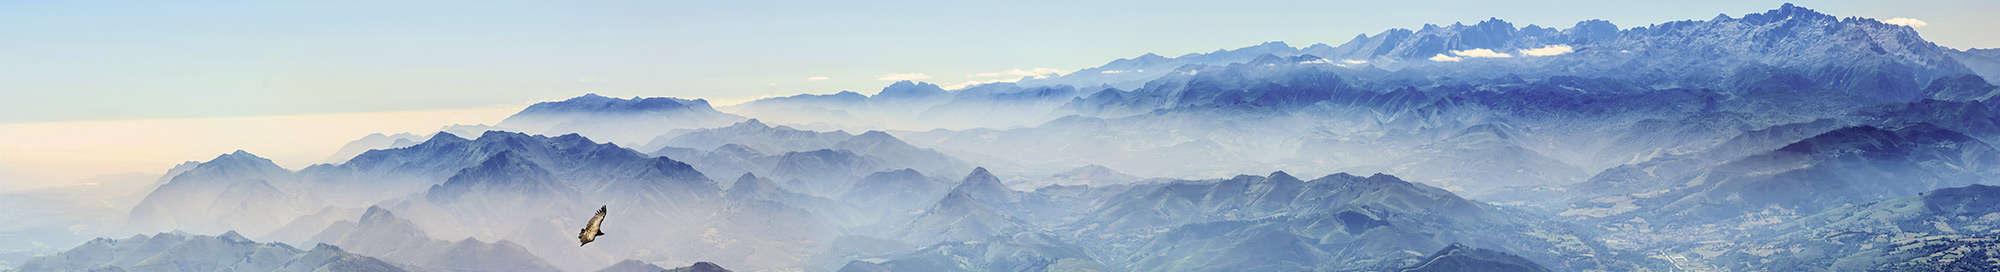 Escapadas fin de semana En la montaña en Escaldes-Engordany